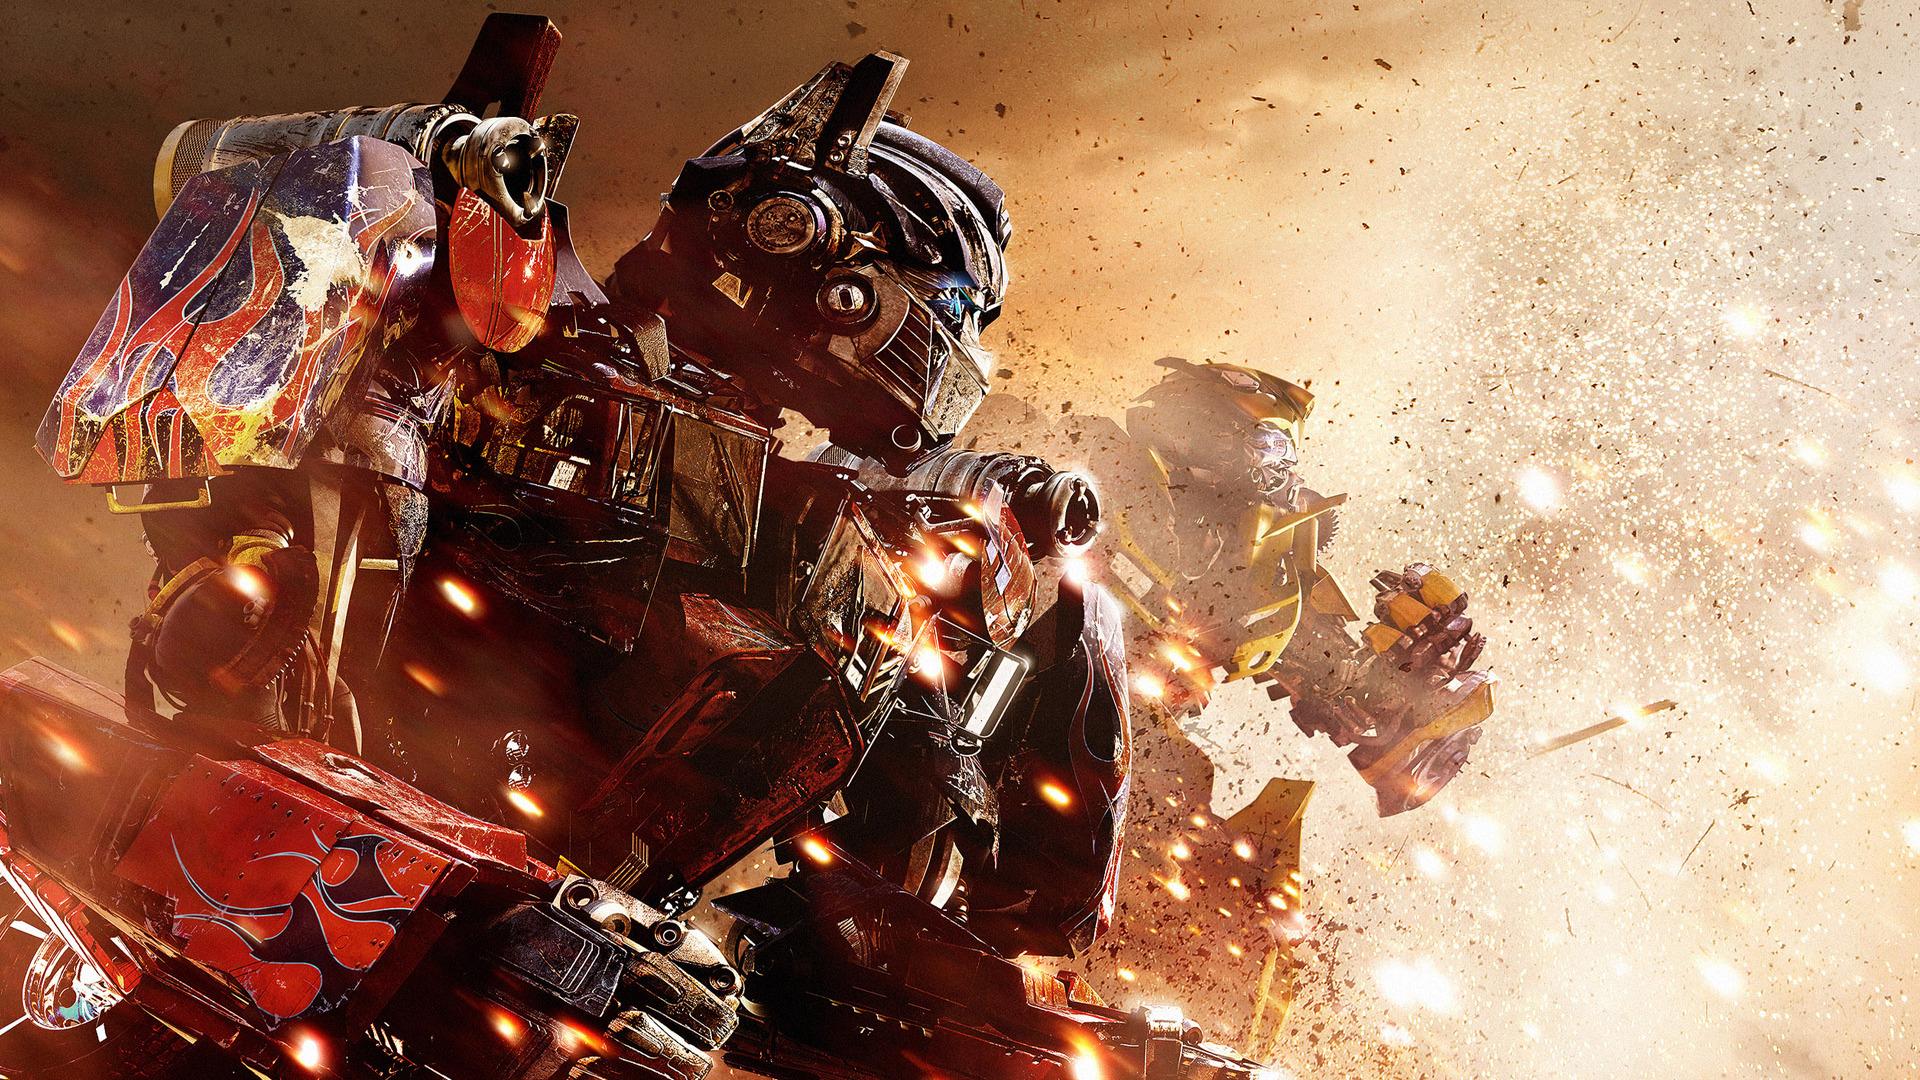 Free Optimus Bumblebee In Transformers 3 Wallpapers